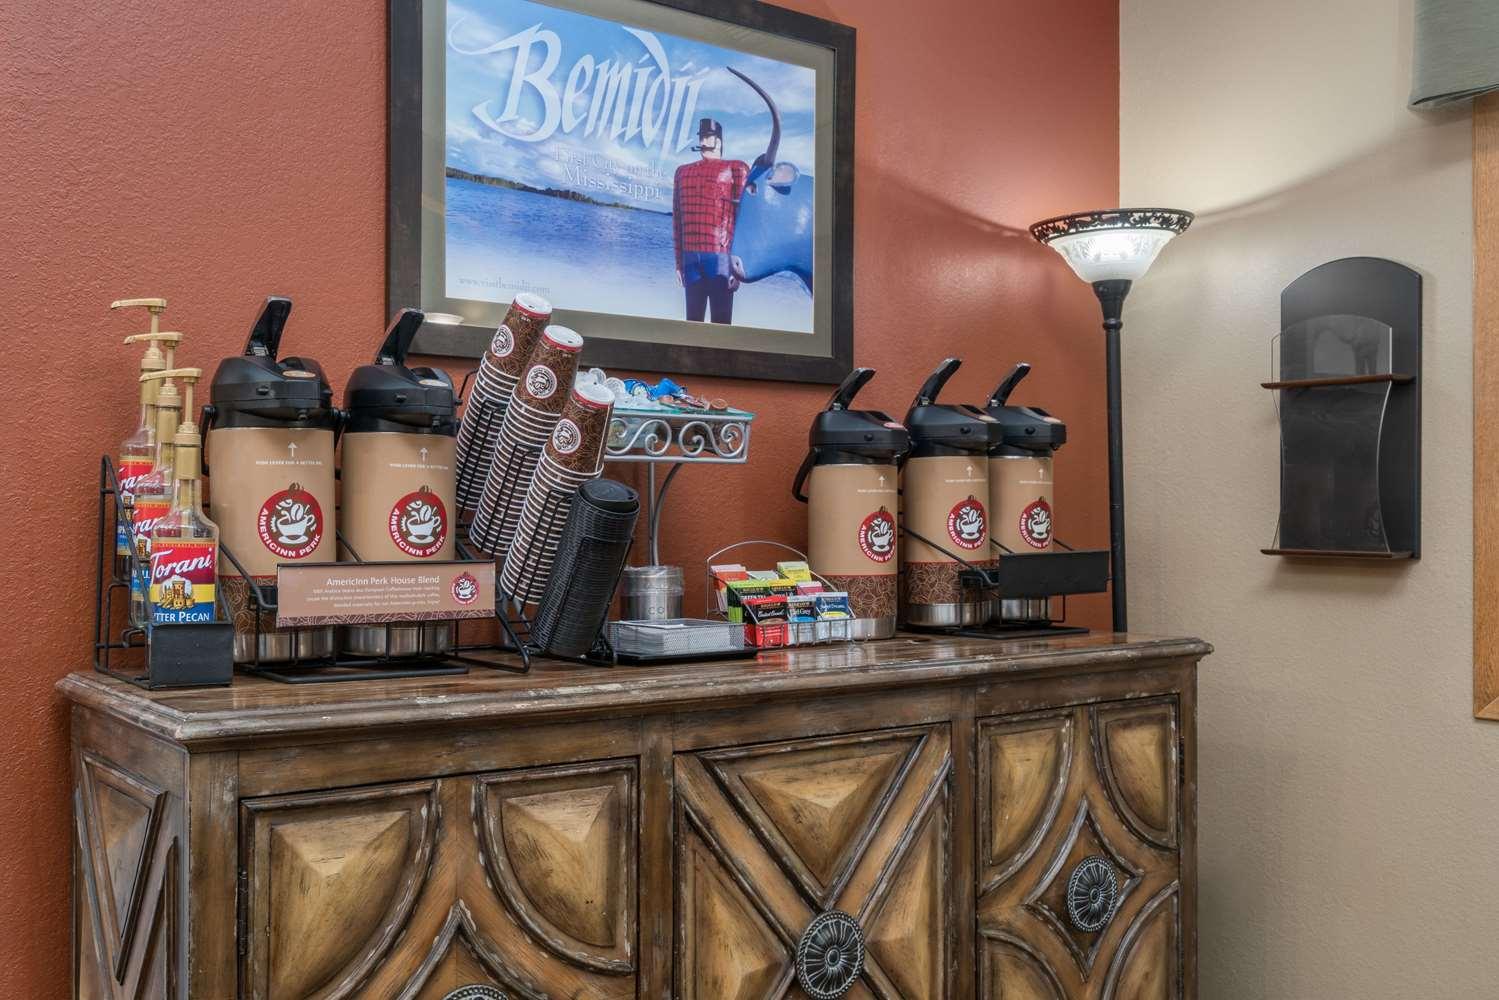 proam - AmericInn Lodge & Suites Bemidji